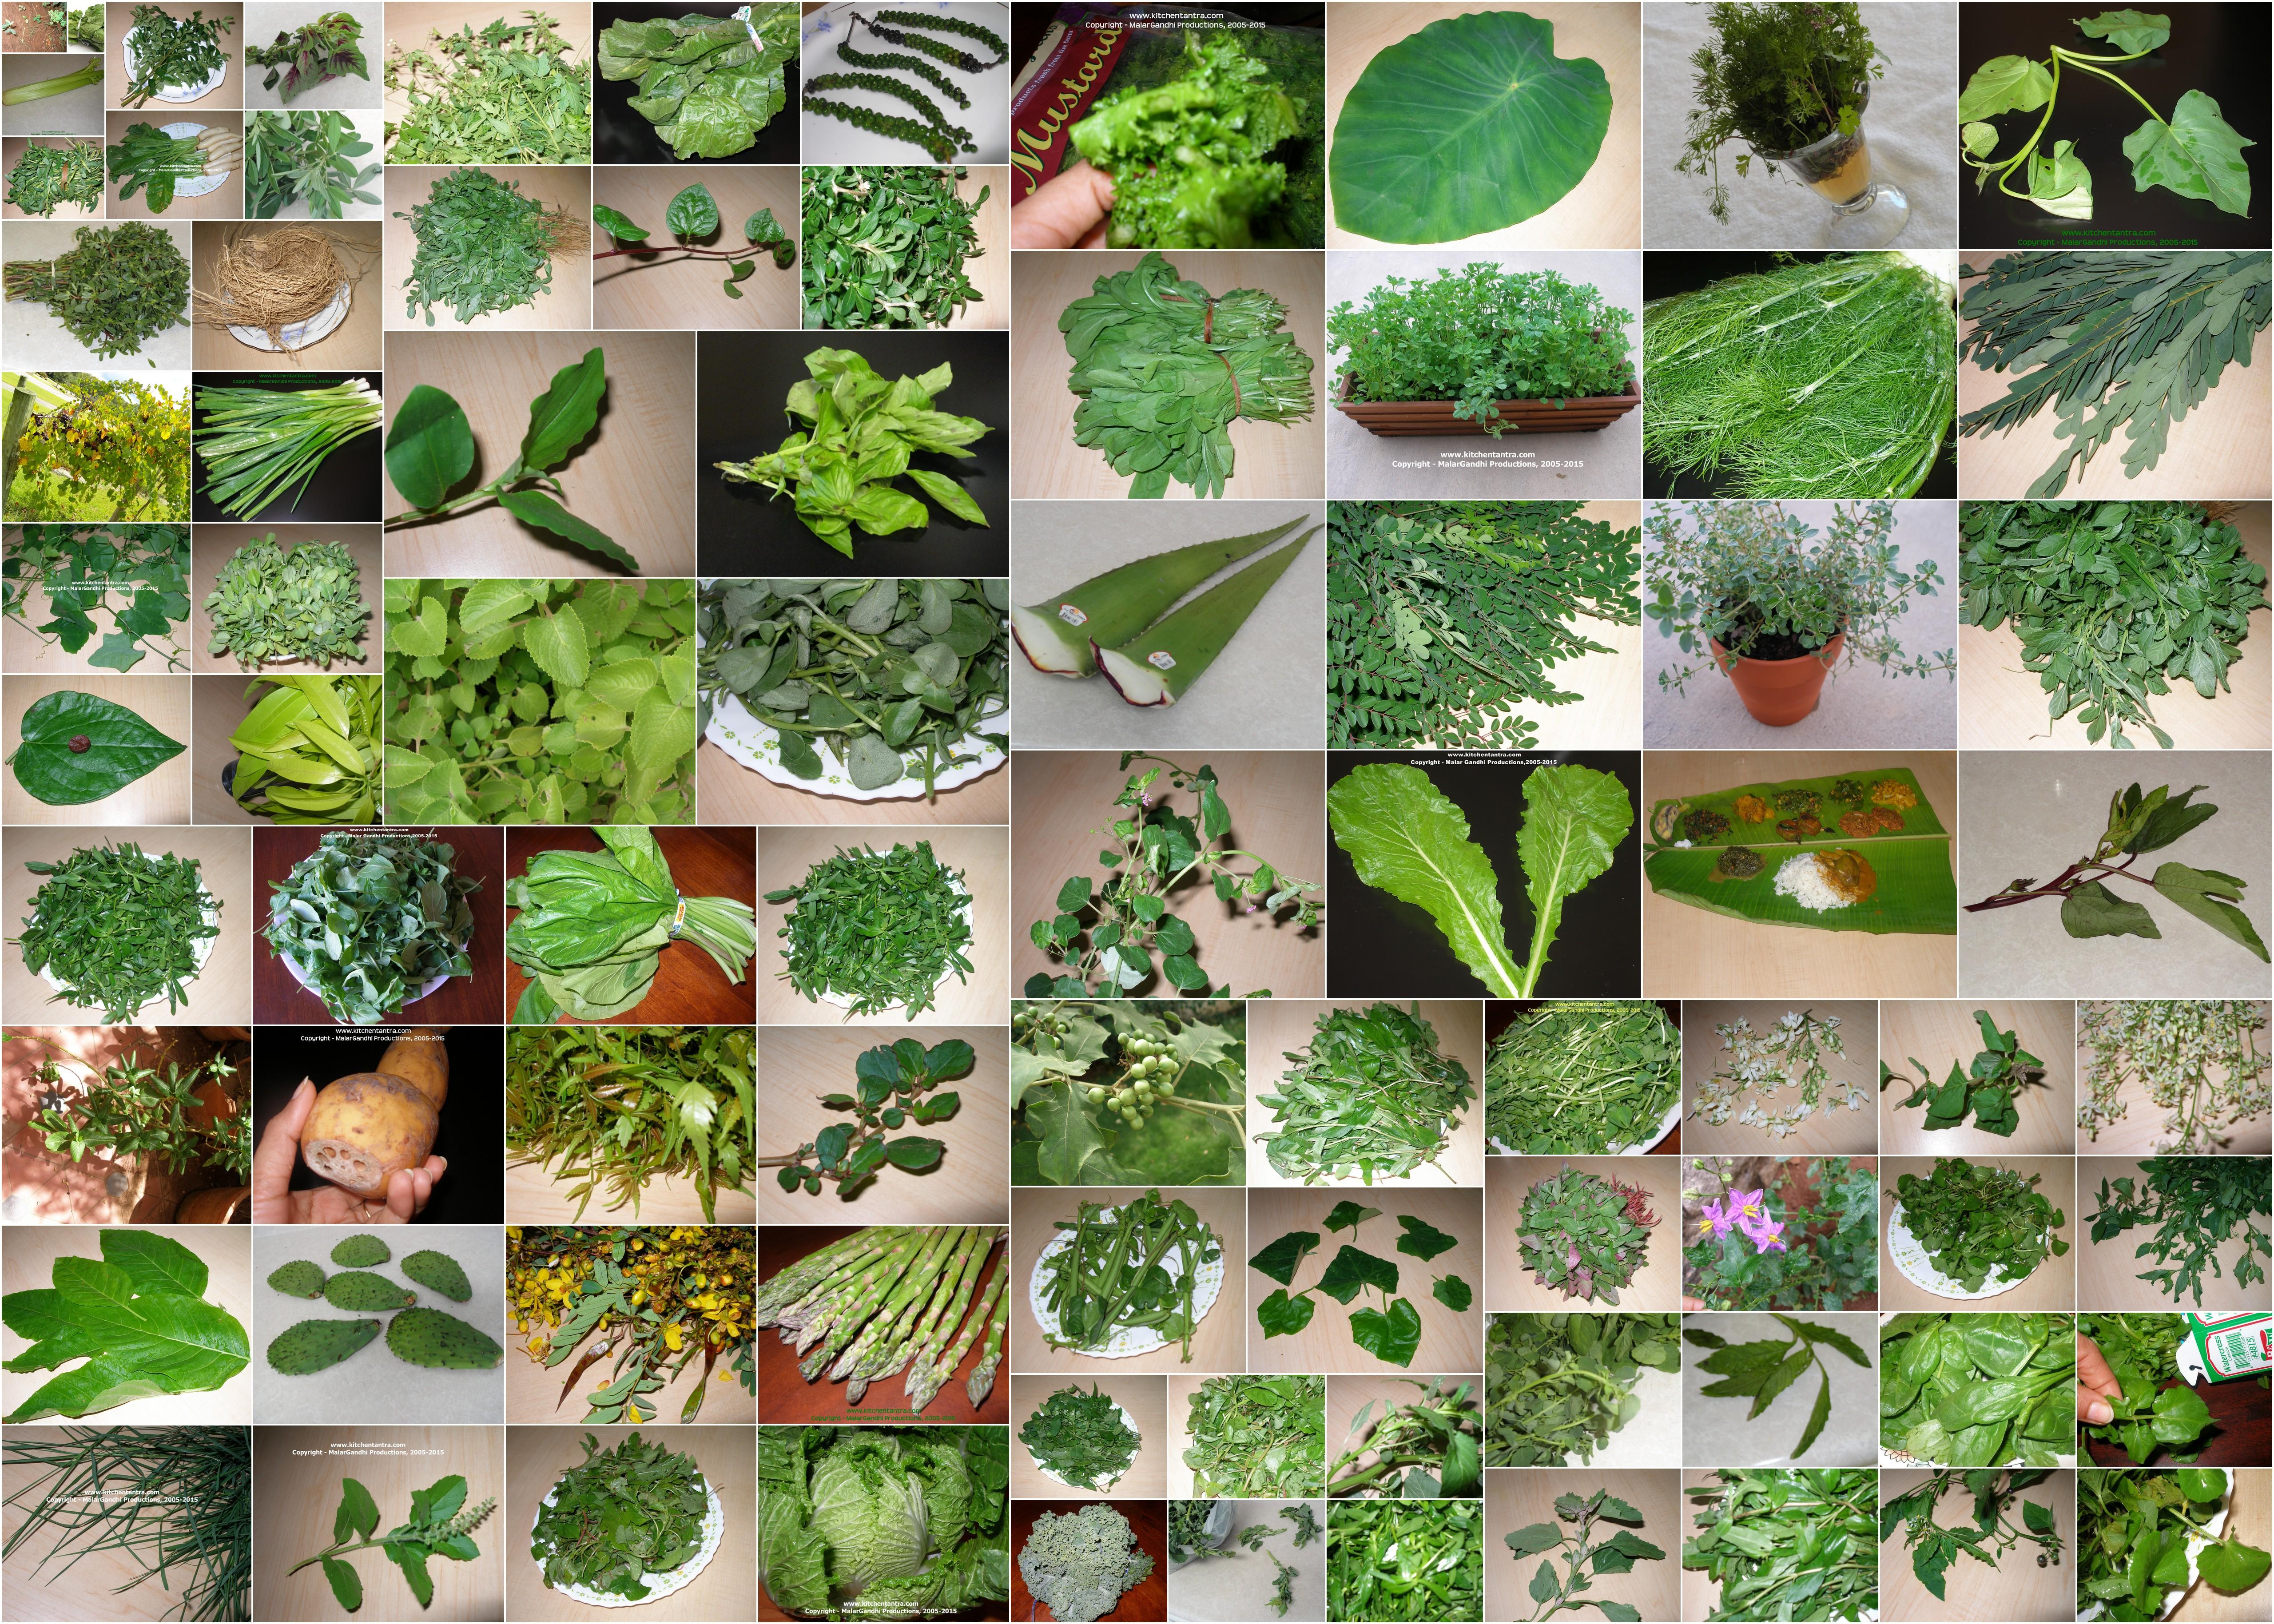 vegetables in thailand